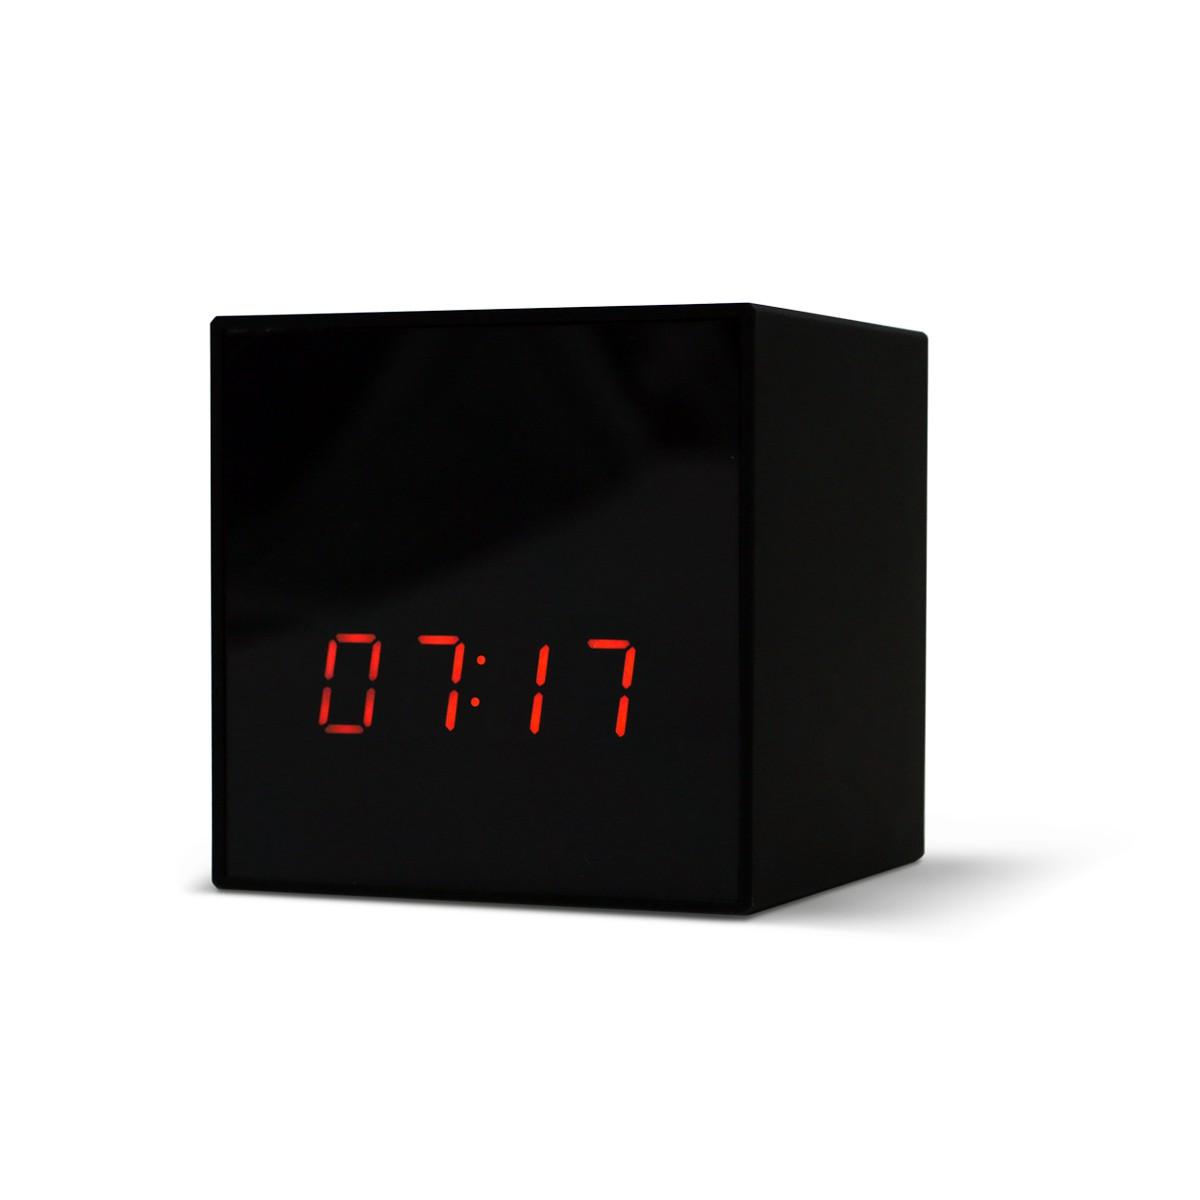 Titathink wireless clock IP camera